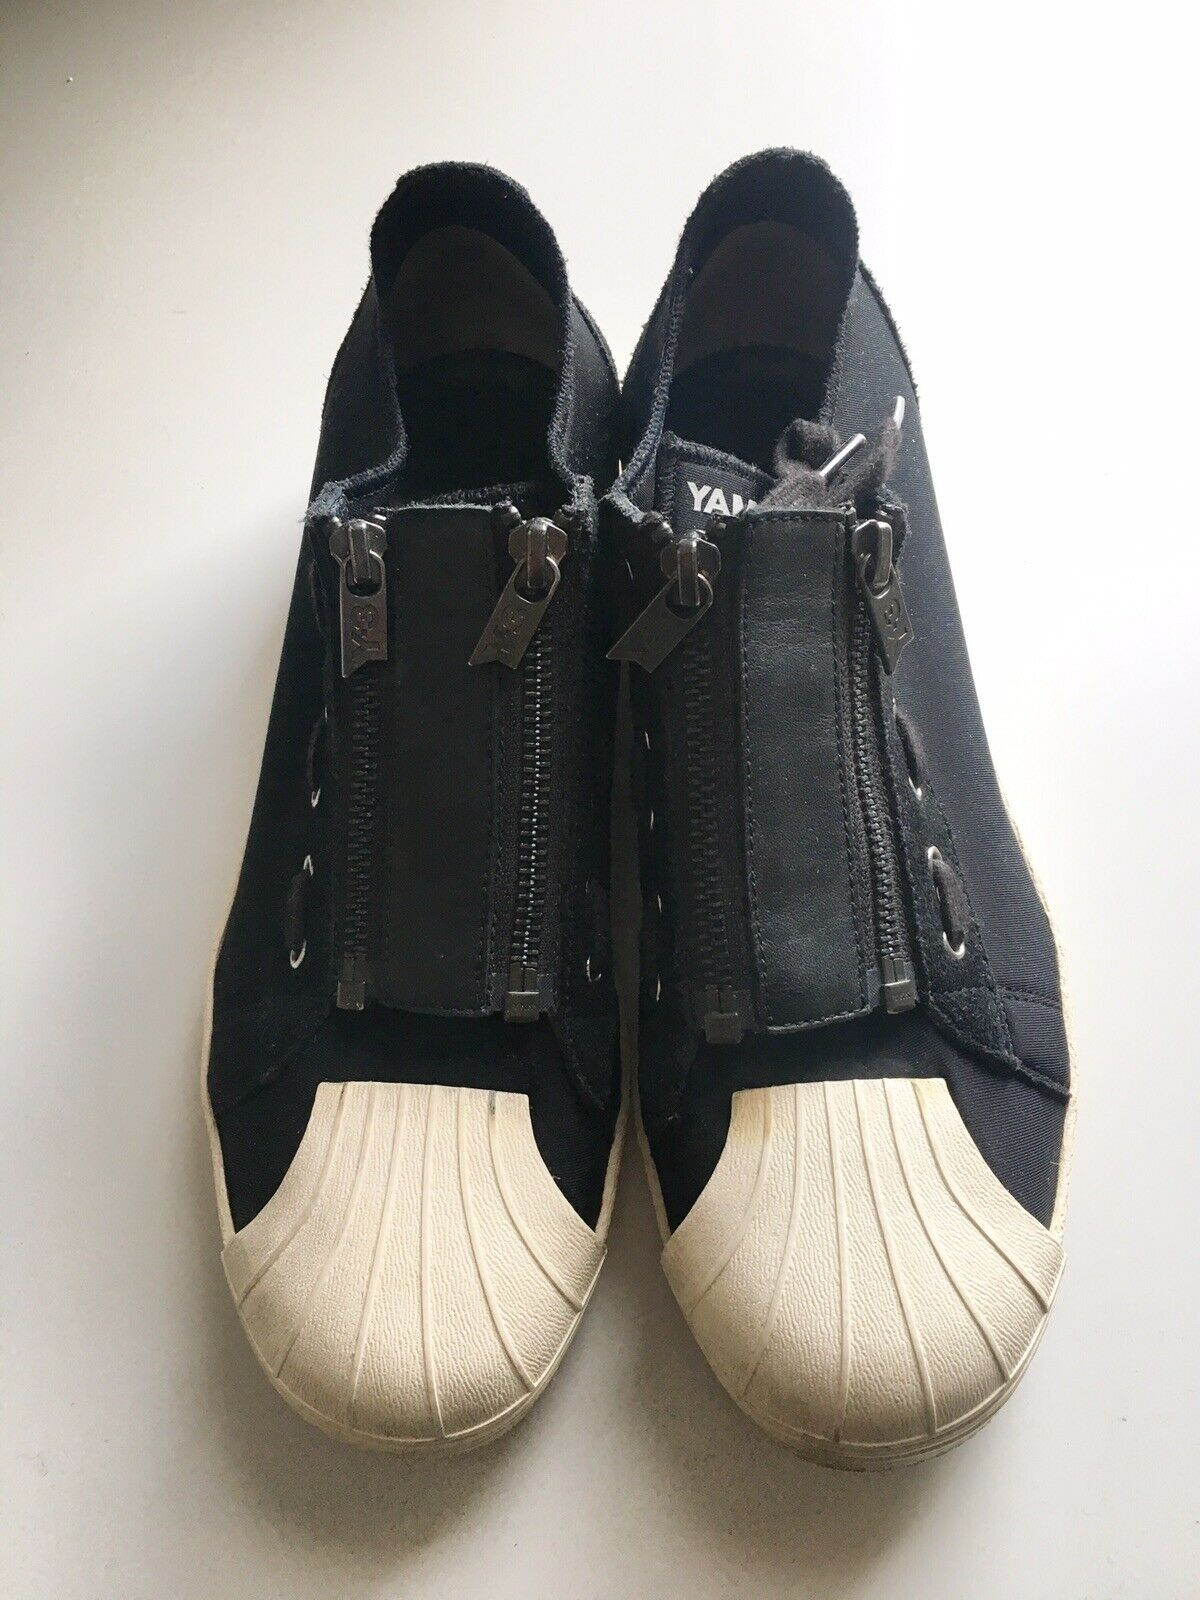 Yohji Yamamoto Y-3 Super Zip Sneaker Size 7 Mens   Womens 9